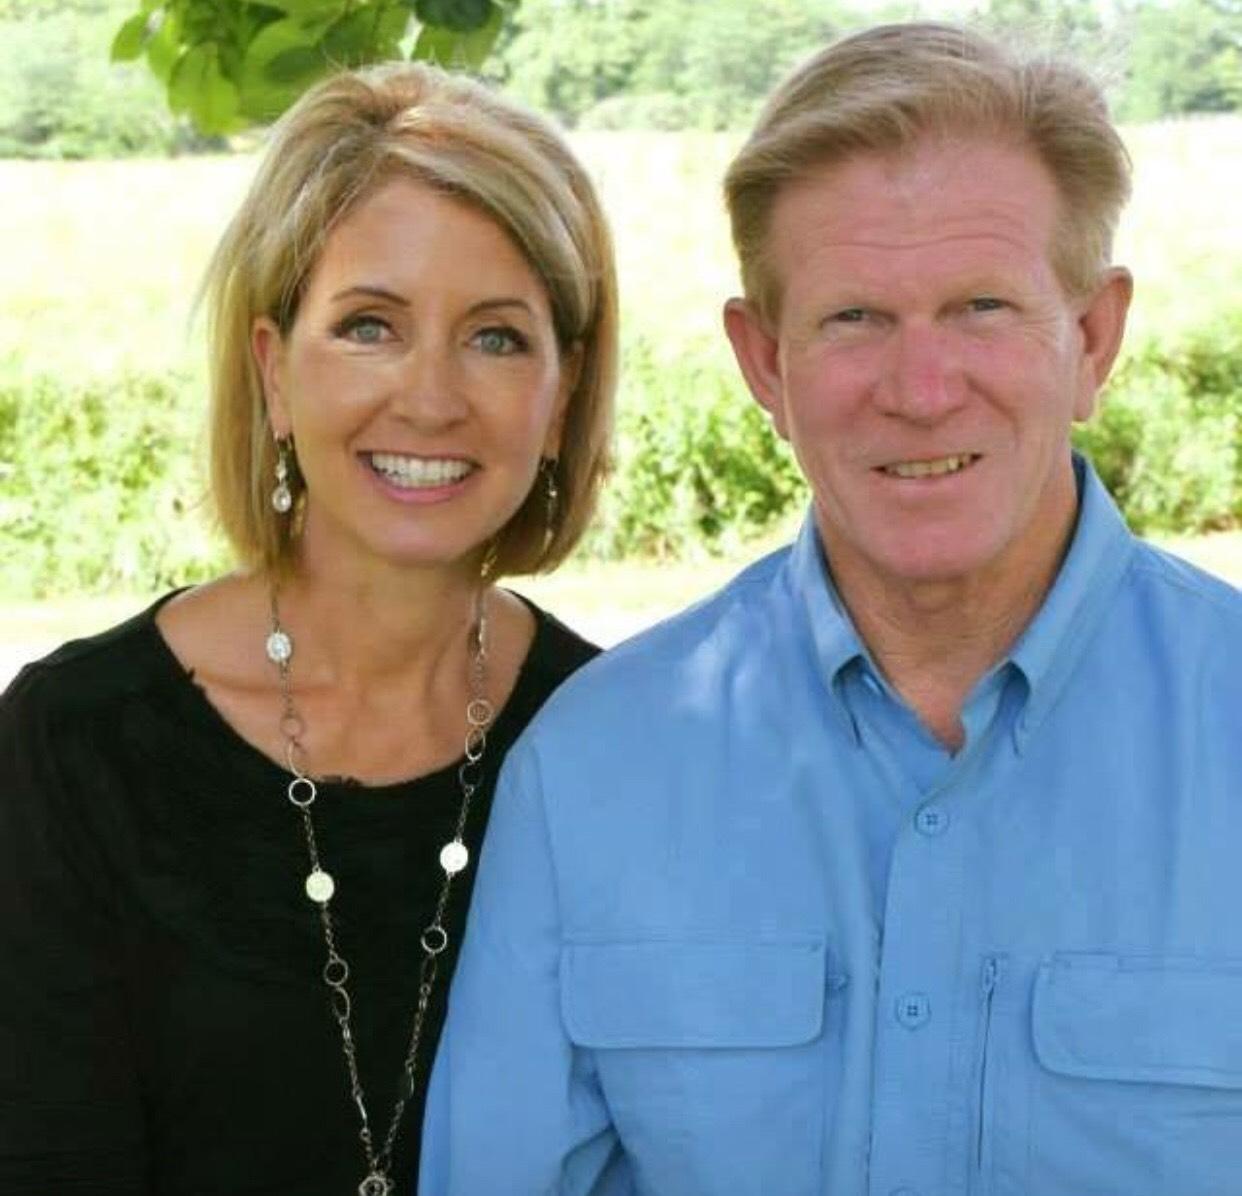 Chris Miller Files For 110th State Representative